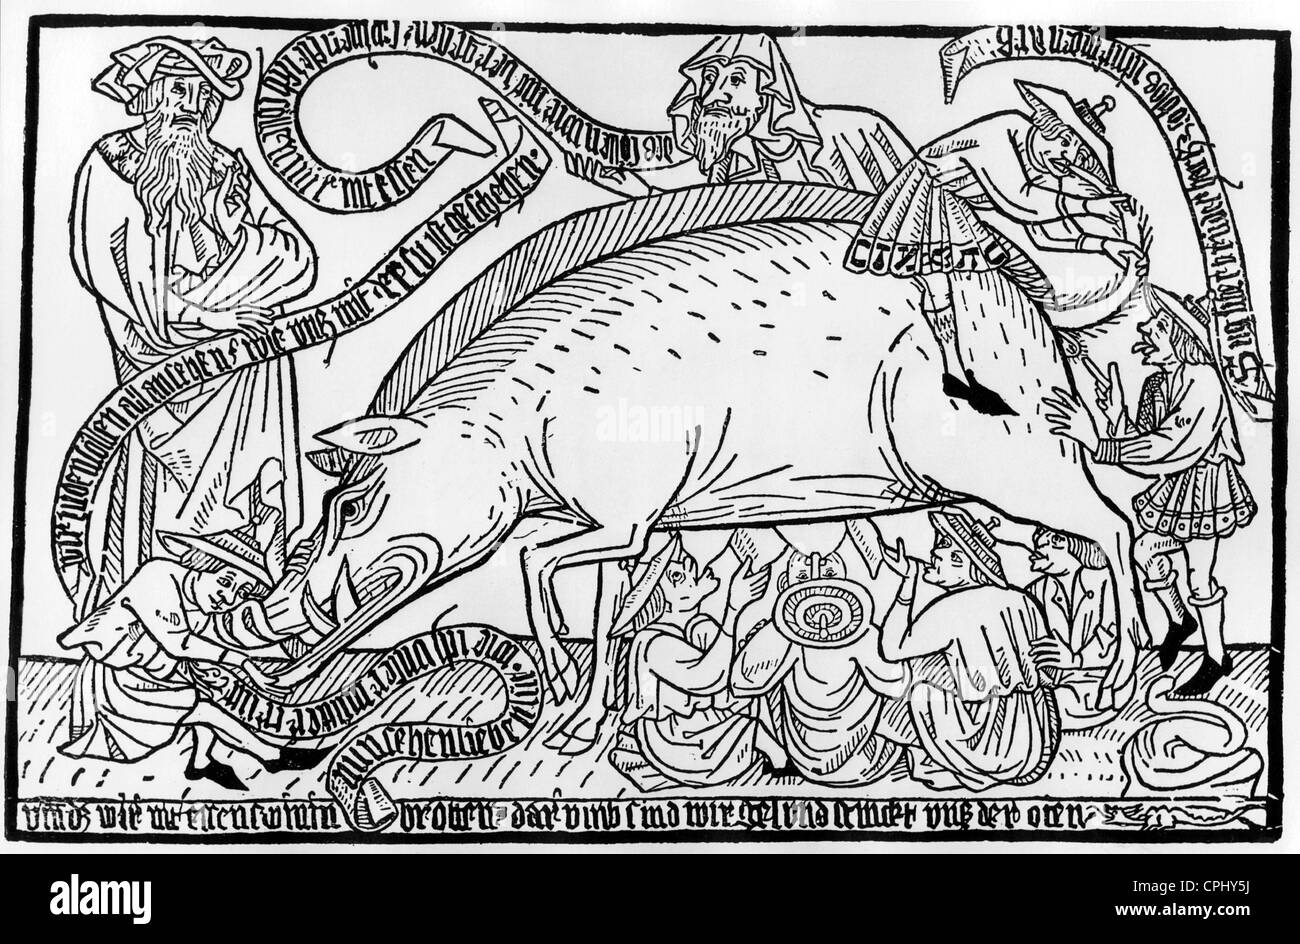 Anti-semitic pamphlet titled 'Das Judenschwein' ('The Jewish Pig'), Frankfurt, 1451 (woodcut) - Stock Image